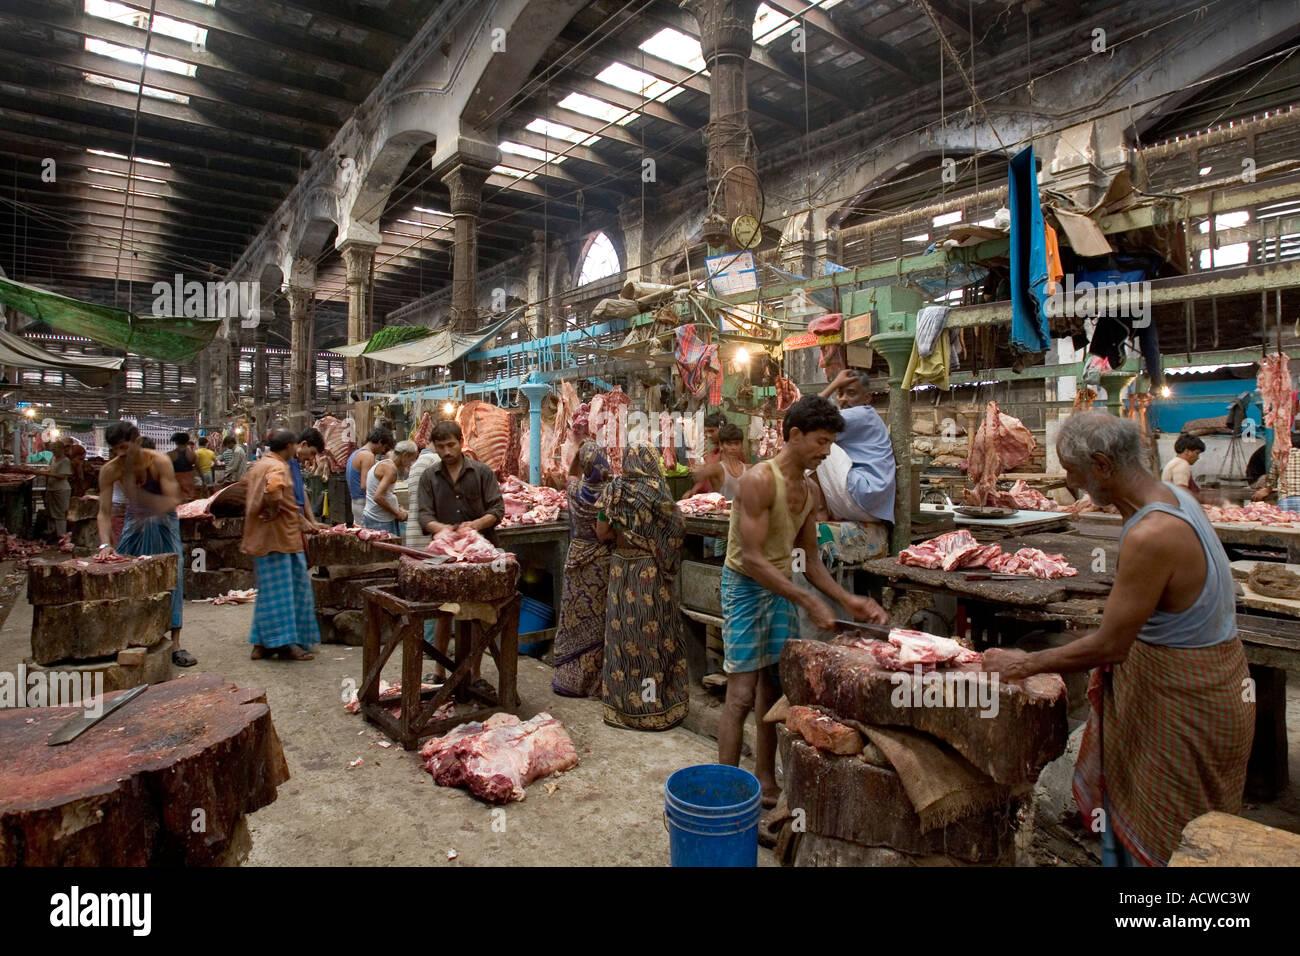 Hogg meat market Calcutta Kolkata India - Stock Image